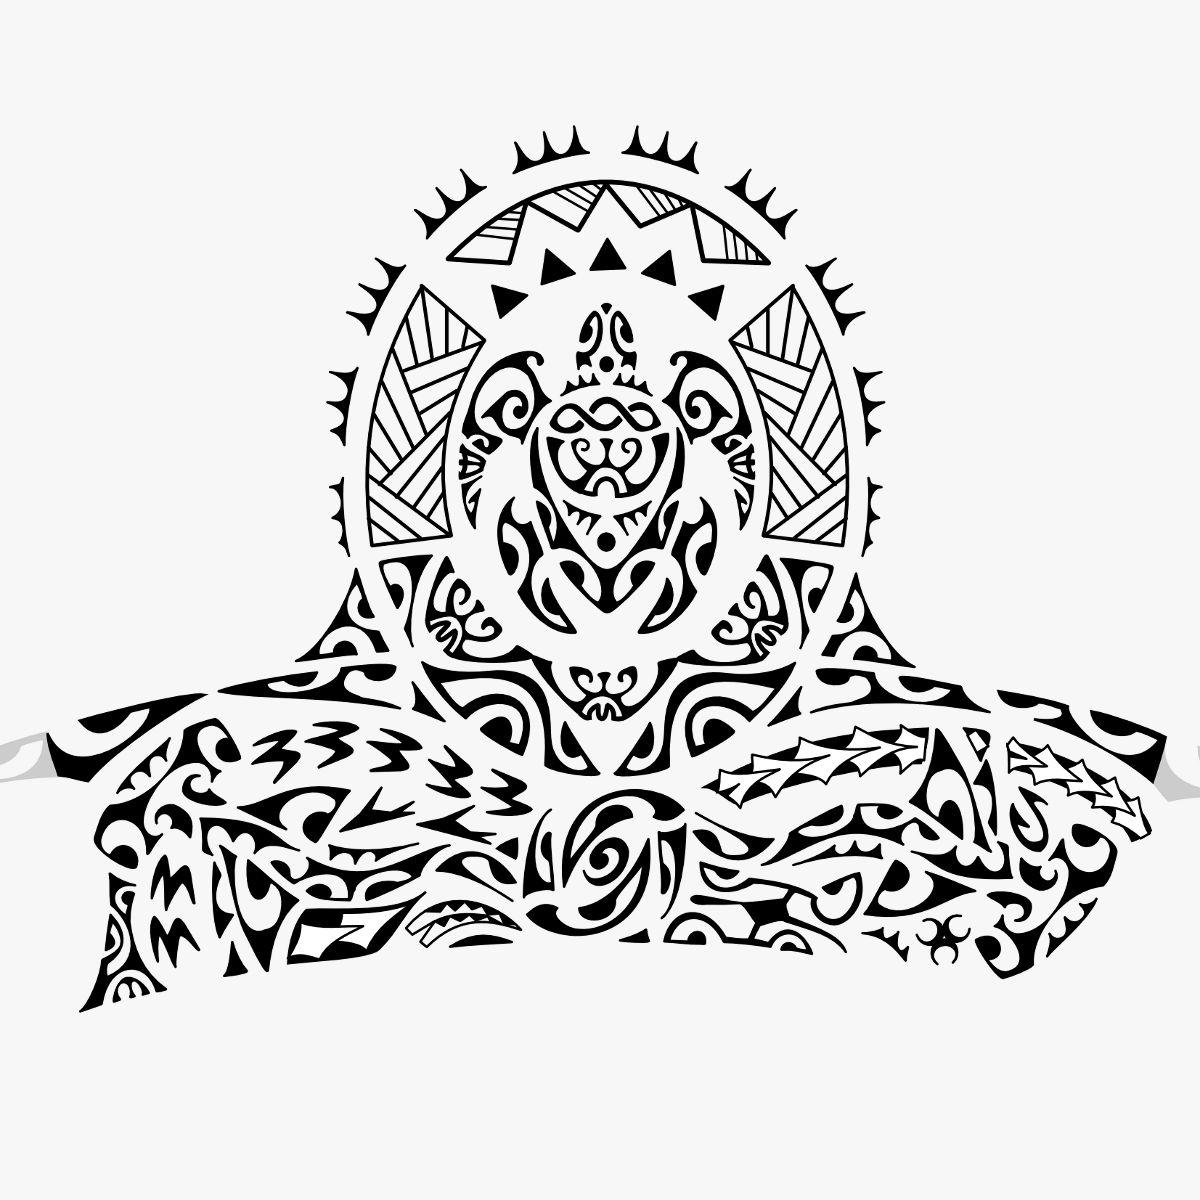 Tetovalas Mintak Es Kepek Tetko Baratoknak Oceania Maori